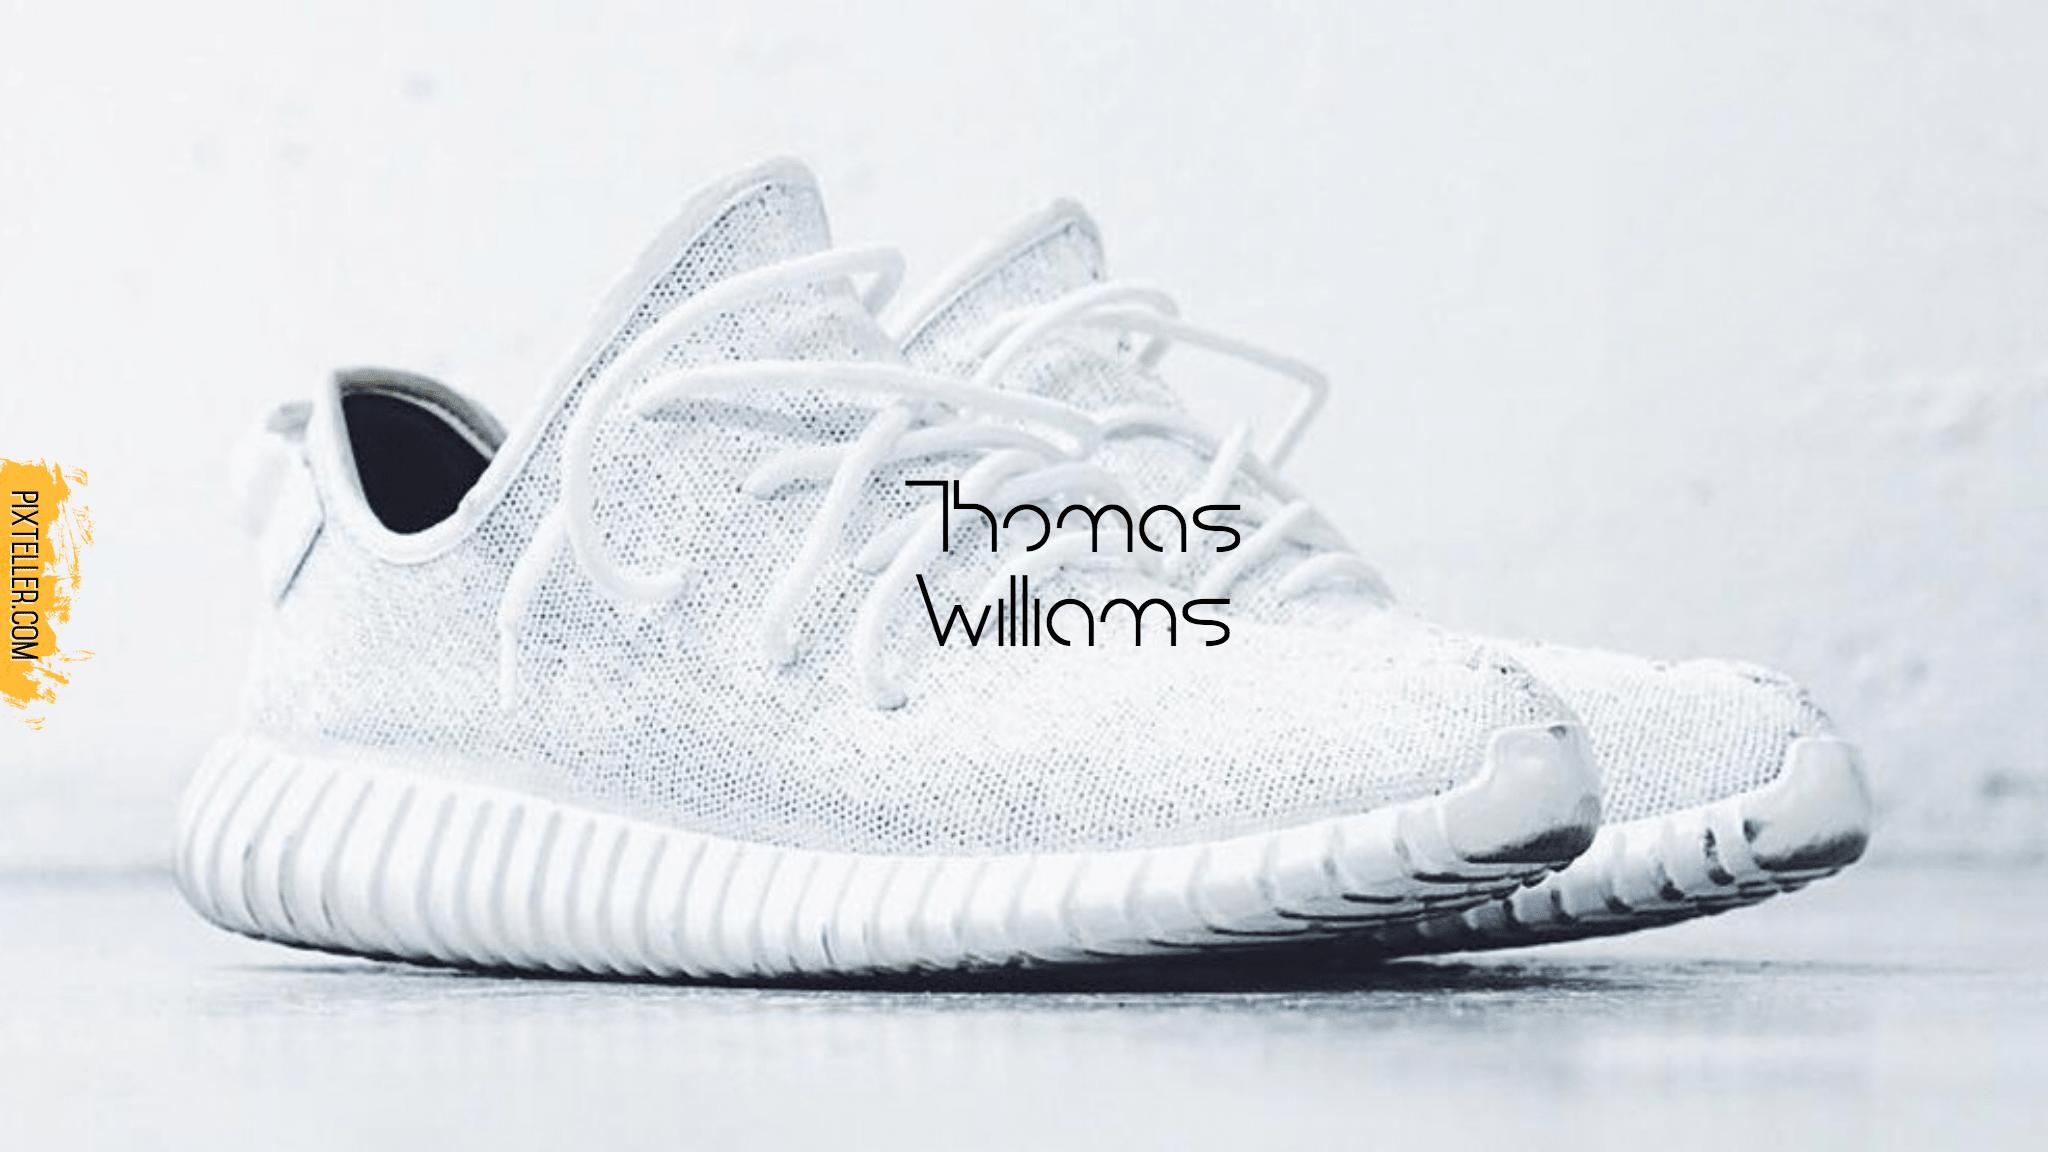 Footwear,                White,                Shoe,                Sneakers,                Product,                Walking,                Photography,                Sportswear,                Design,                 Free Image